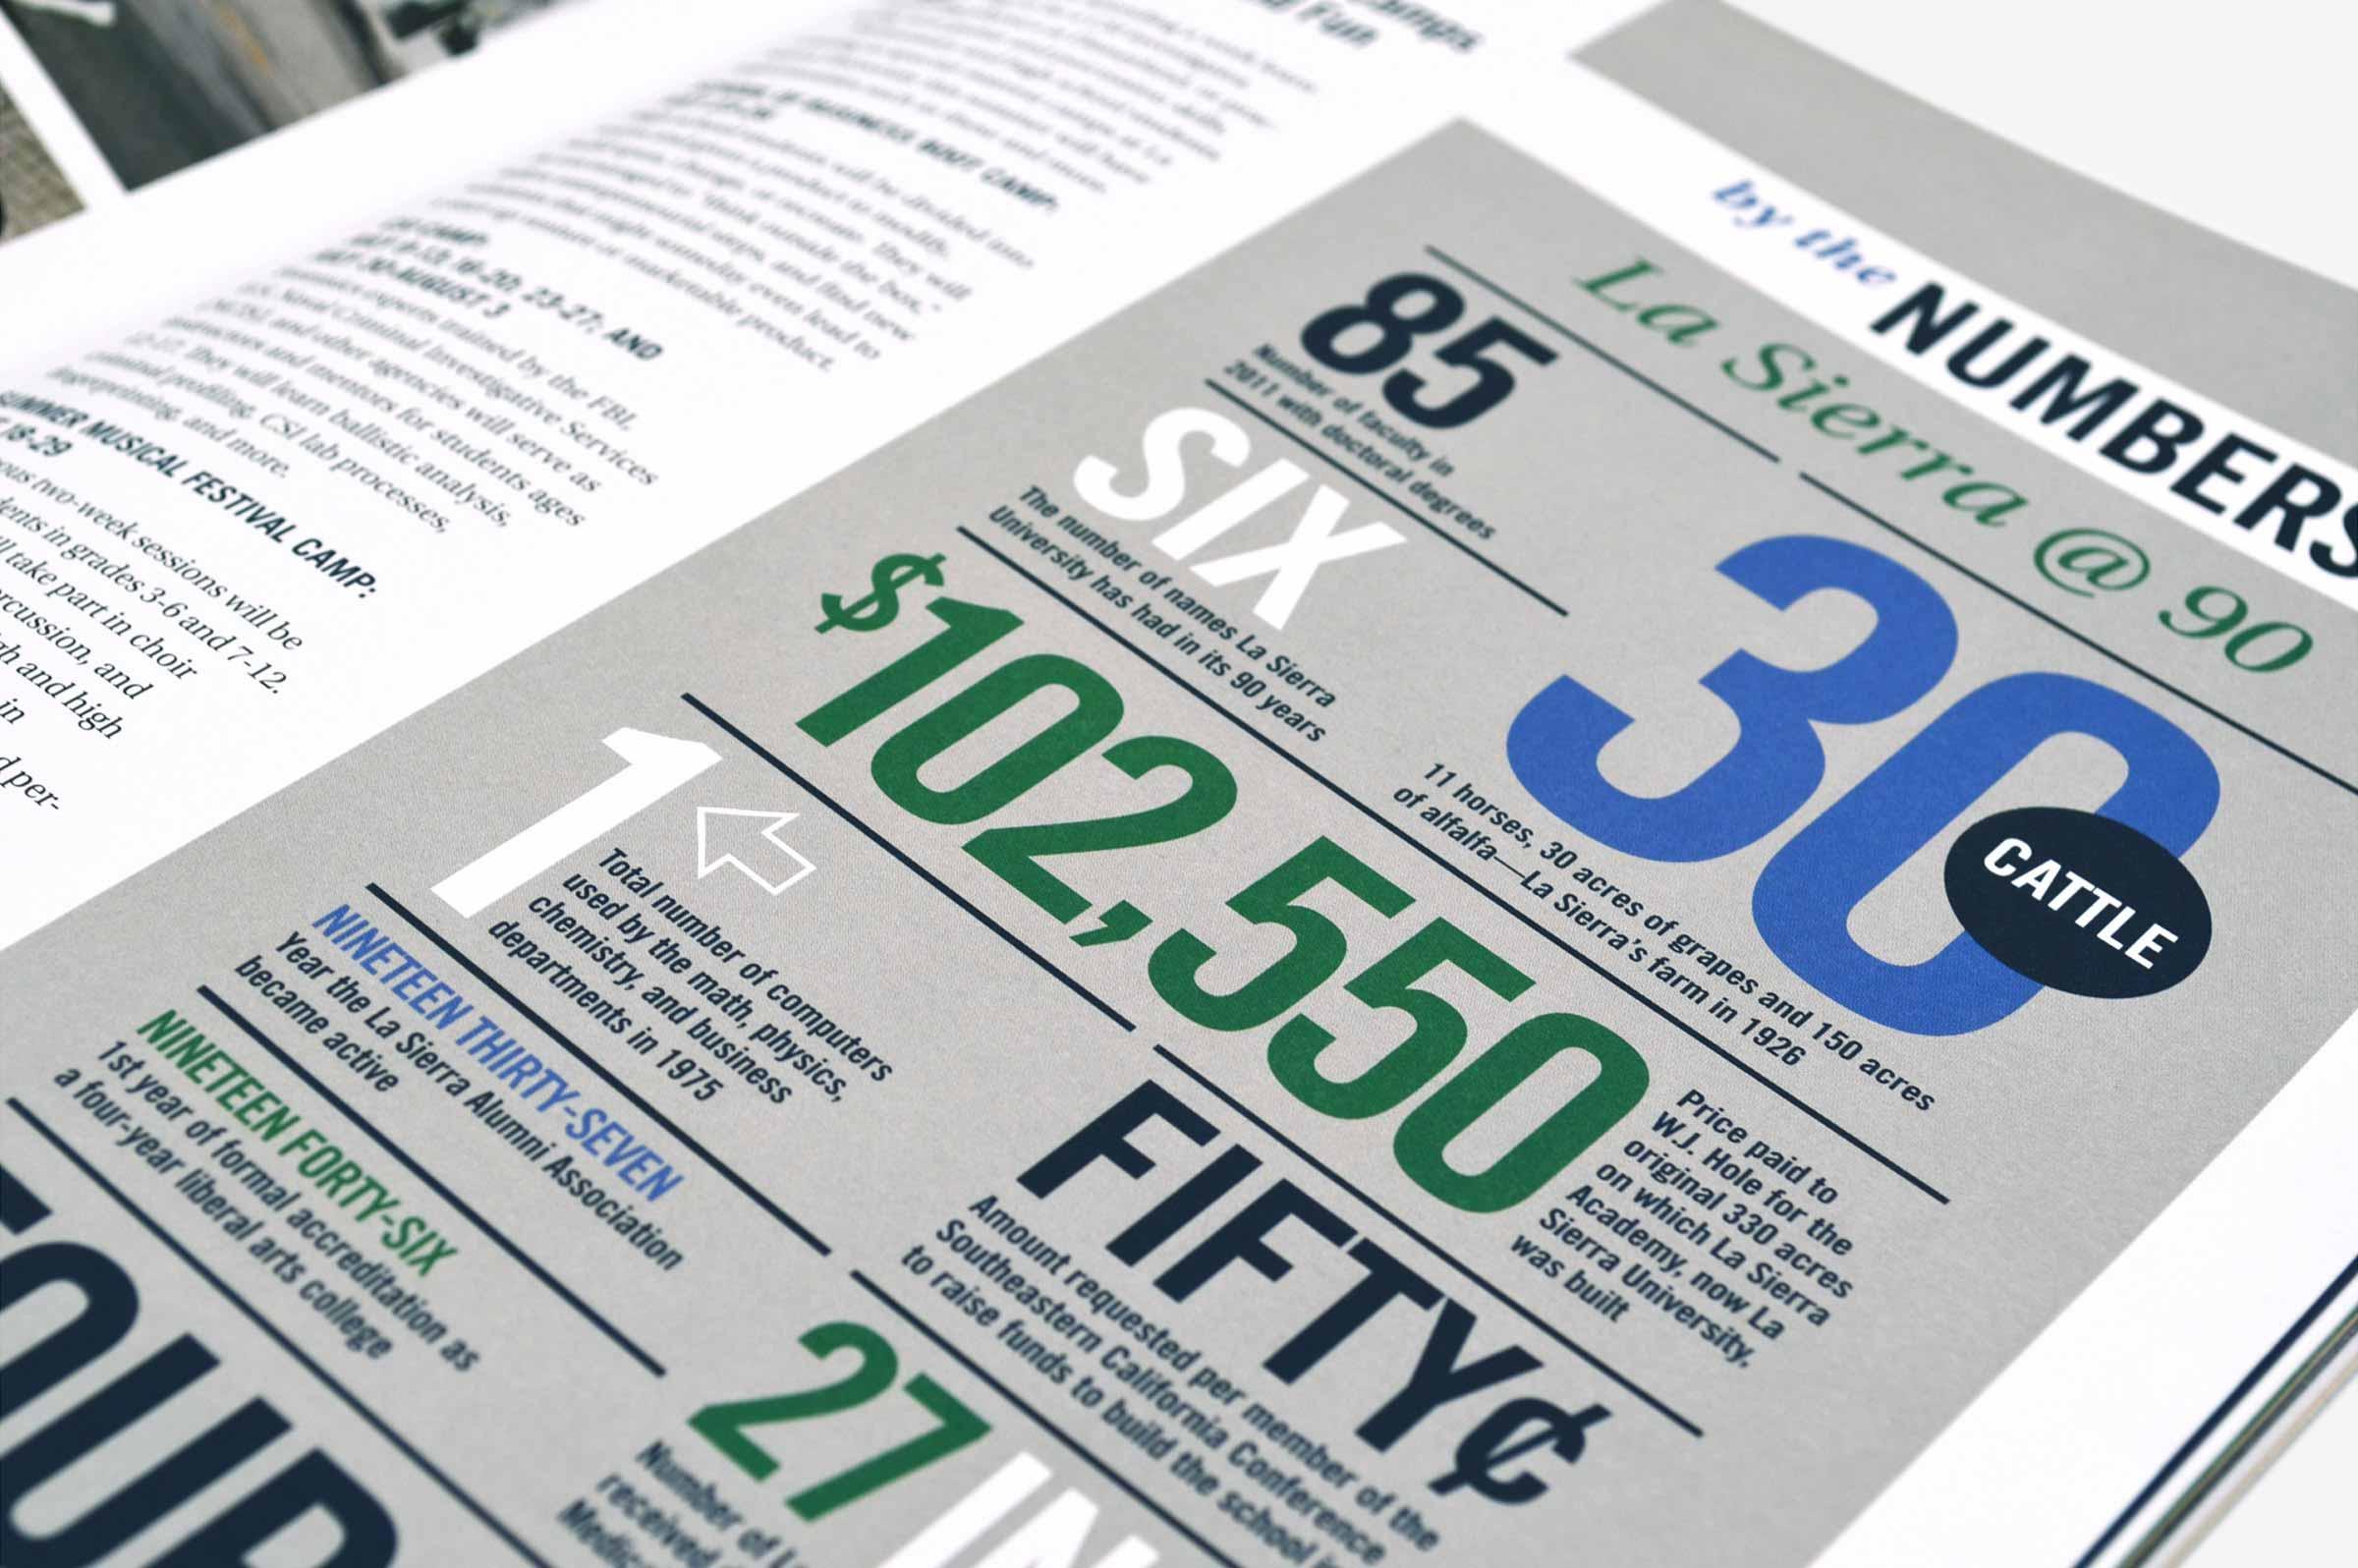 La Sierra University Editorial Magazine Spread Infographic